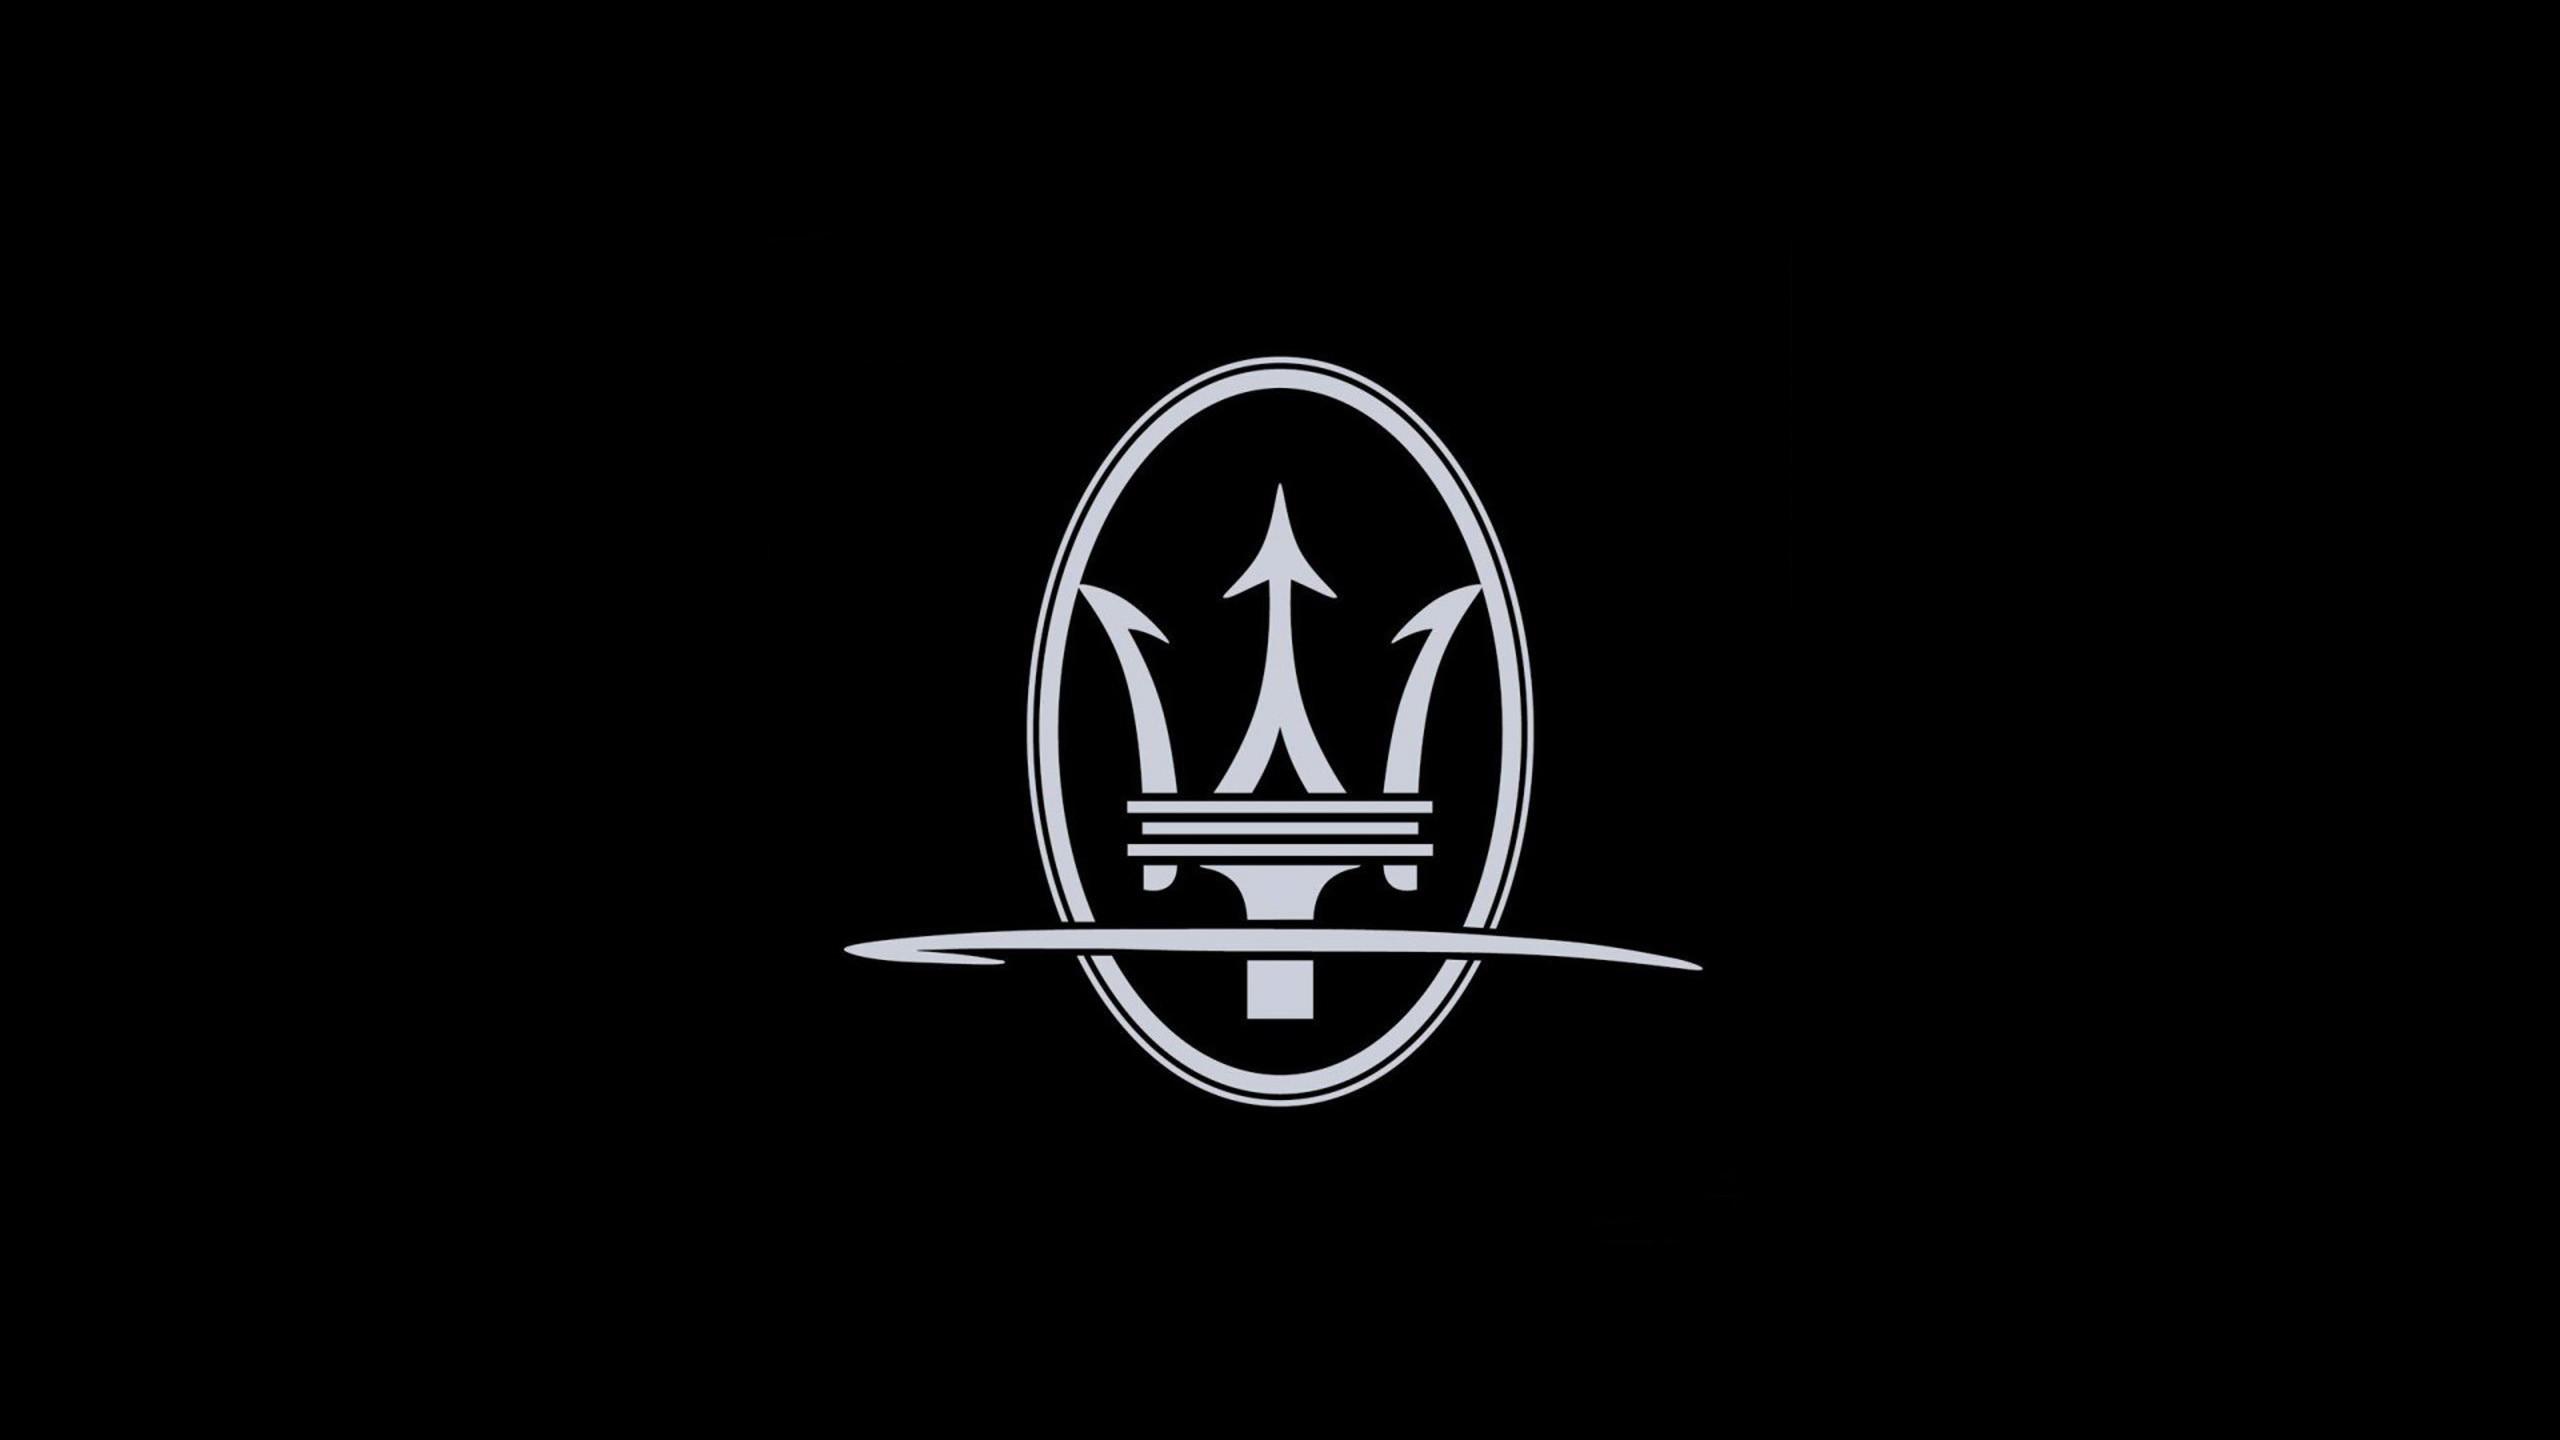 28] Maserati Logo Wallpapers on WallpaperSafari 2560x1440